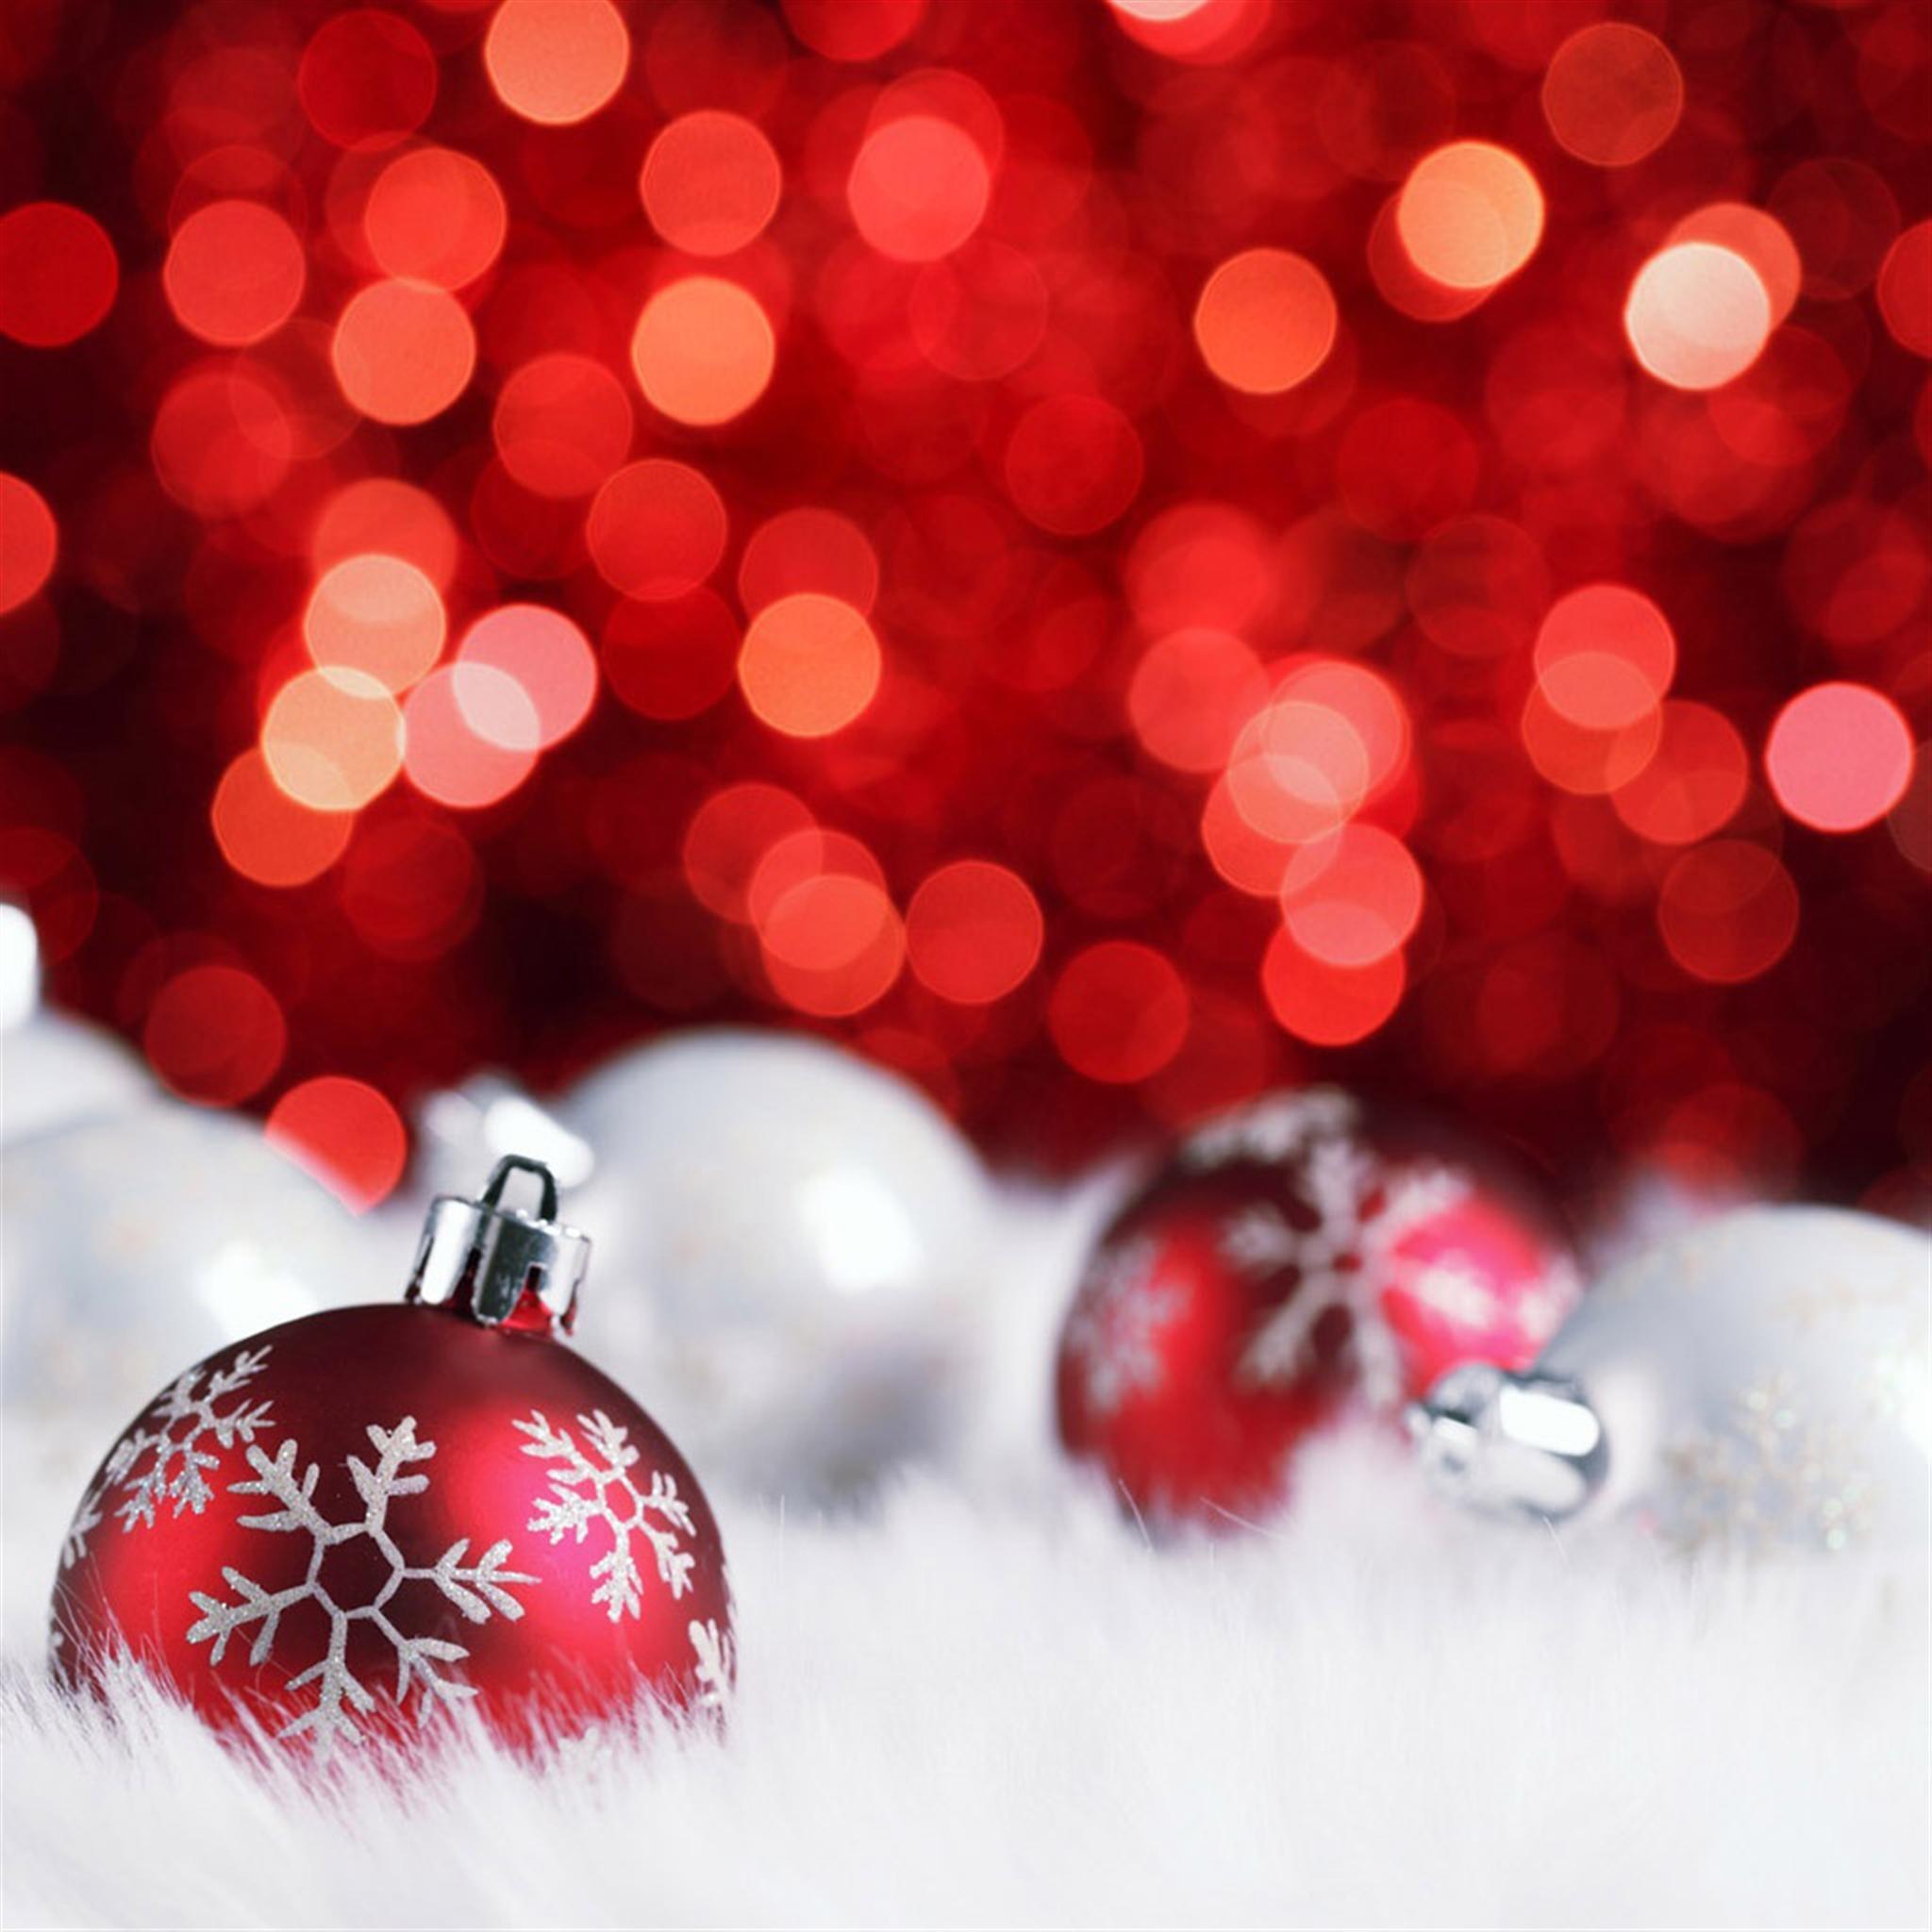 wallpaper.wiki-iPad-retina-air-wallpaper-Christmas-holidays-